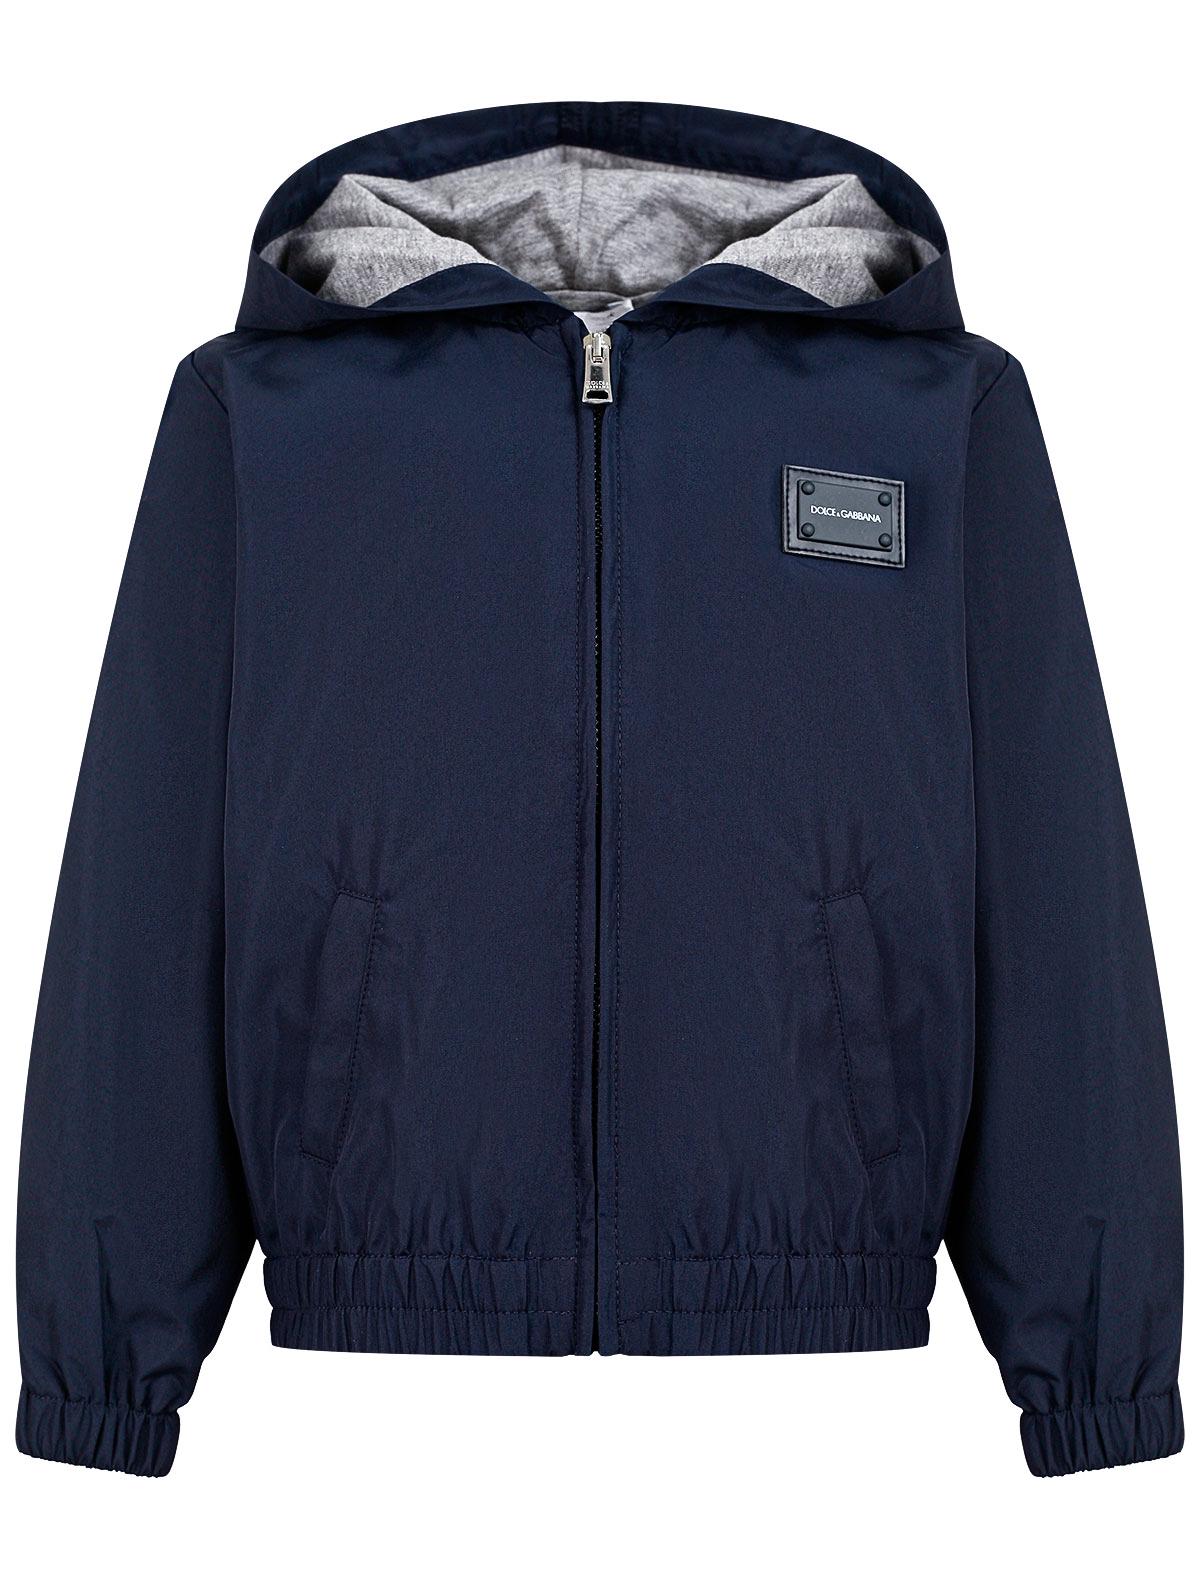 Куртка Dolce & Gabbana синего цвета